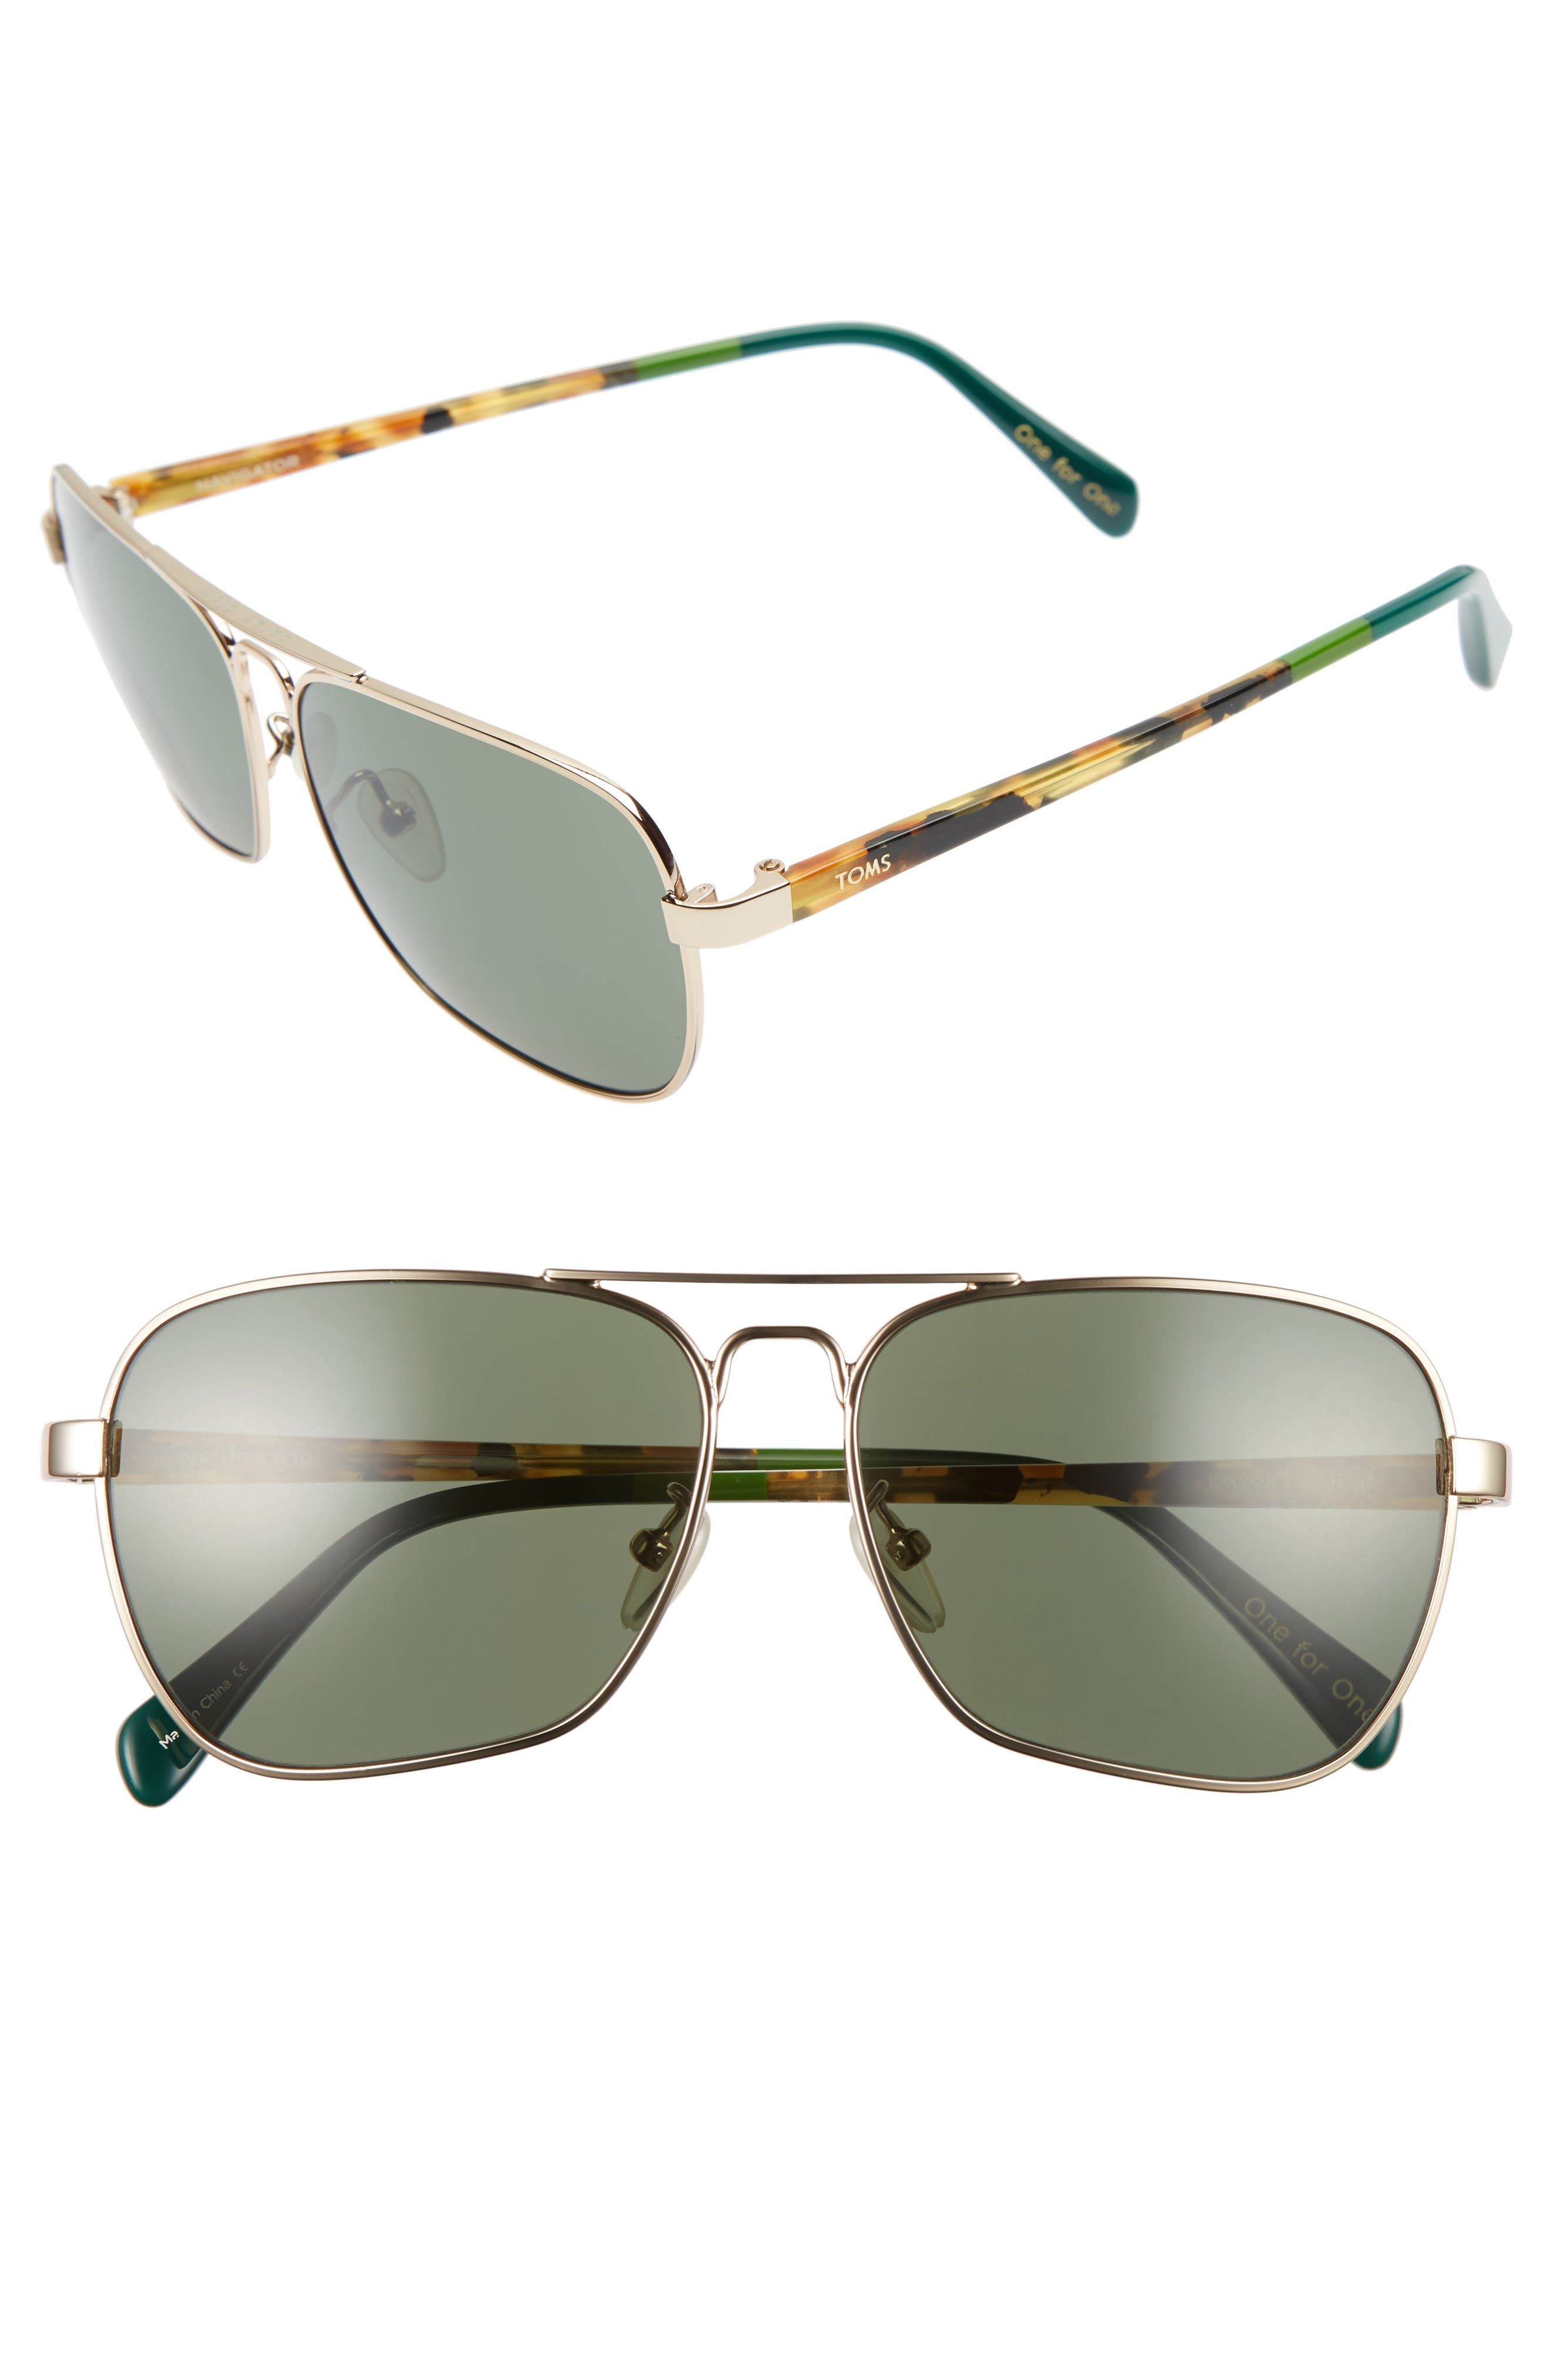 Navigator 201 58mm Sunglasses,                             Main thumbnail 1, color,